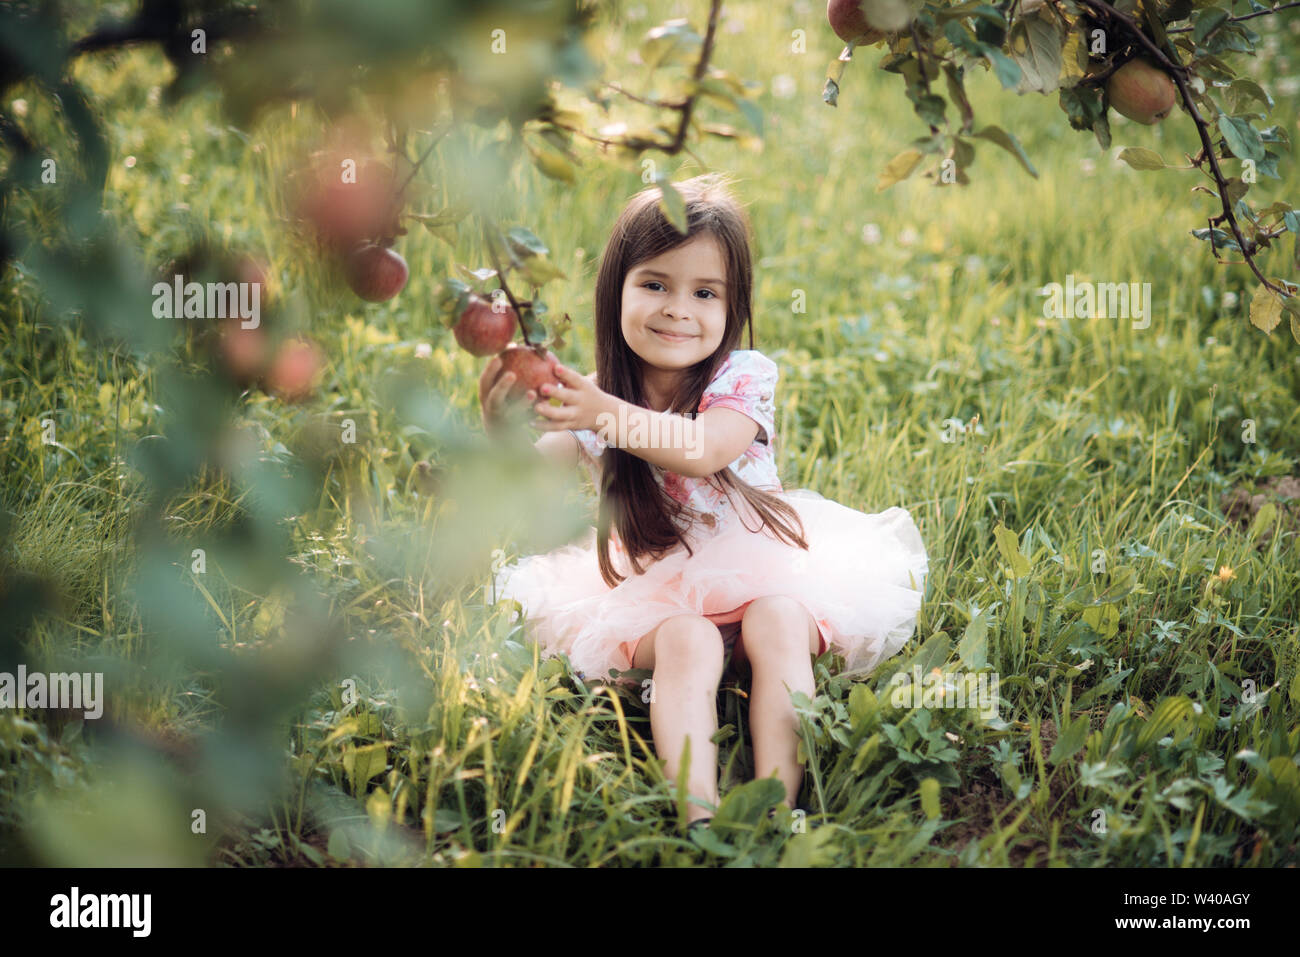 Fruit diet for child health, vitamin. Fruit garden with little girl picking up apples. - Stock Image